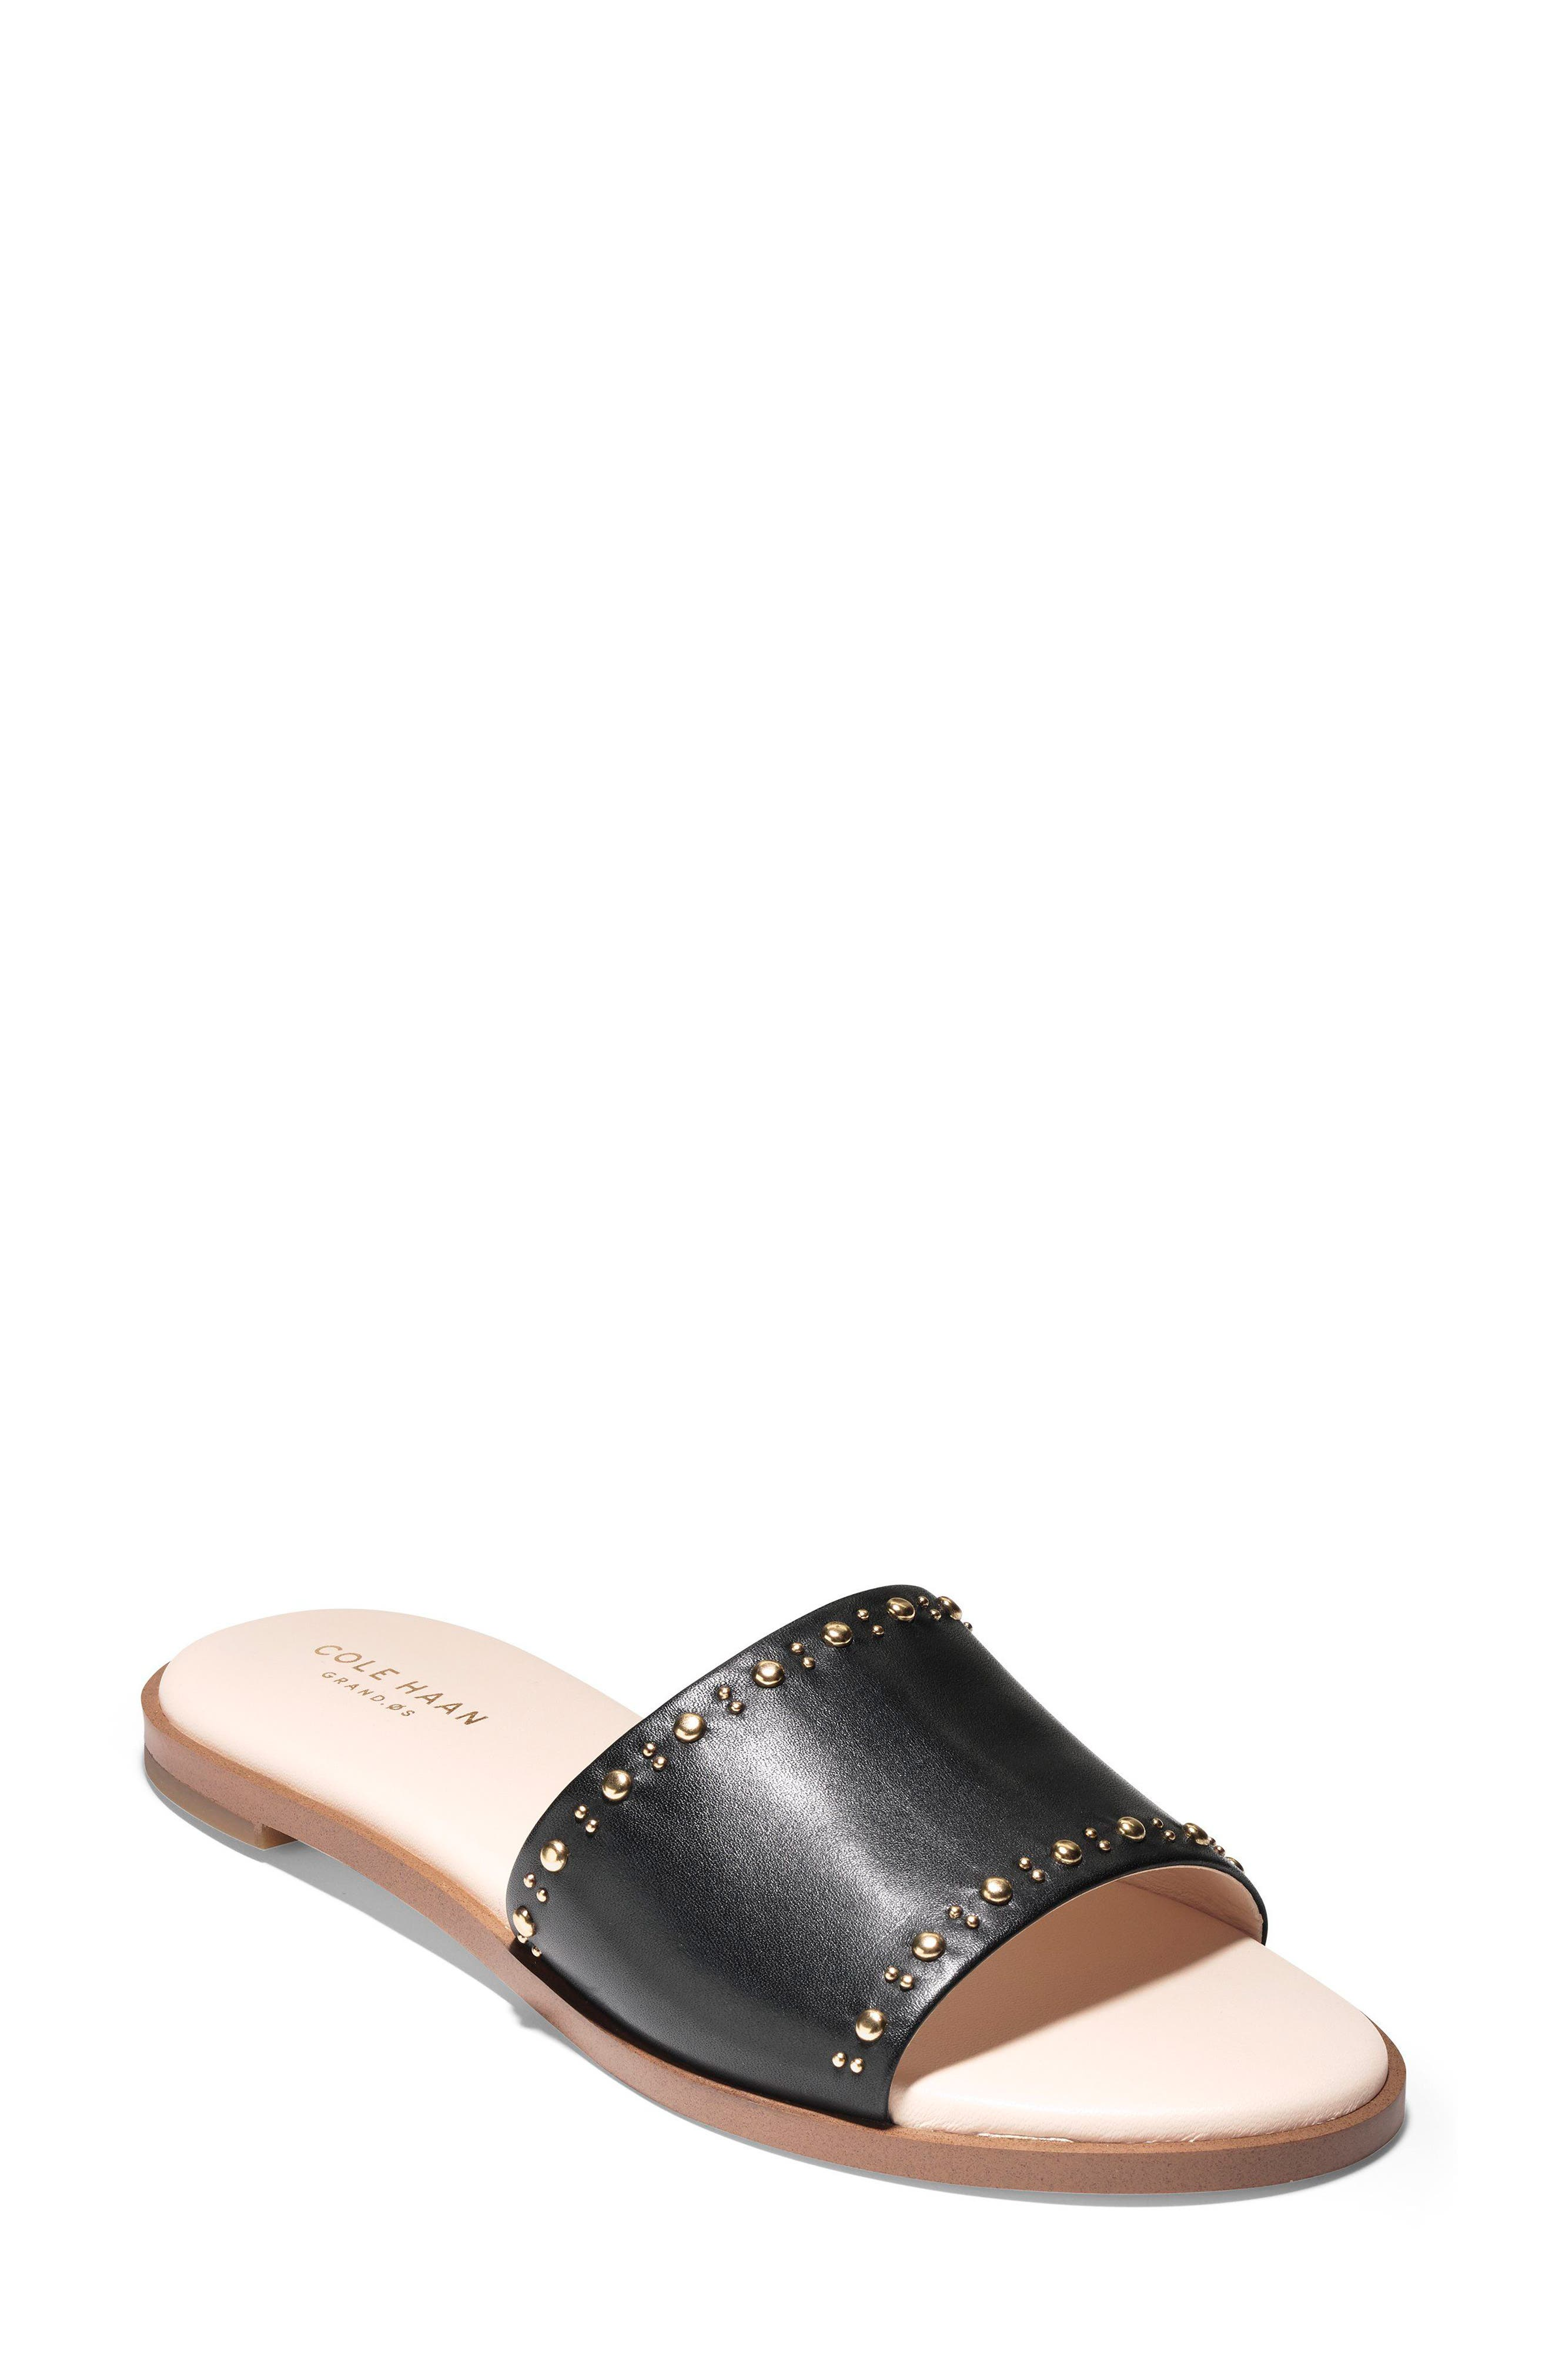 Anica Slide Sandal,                         Main,                         color, 001